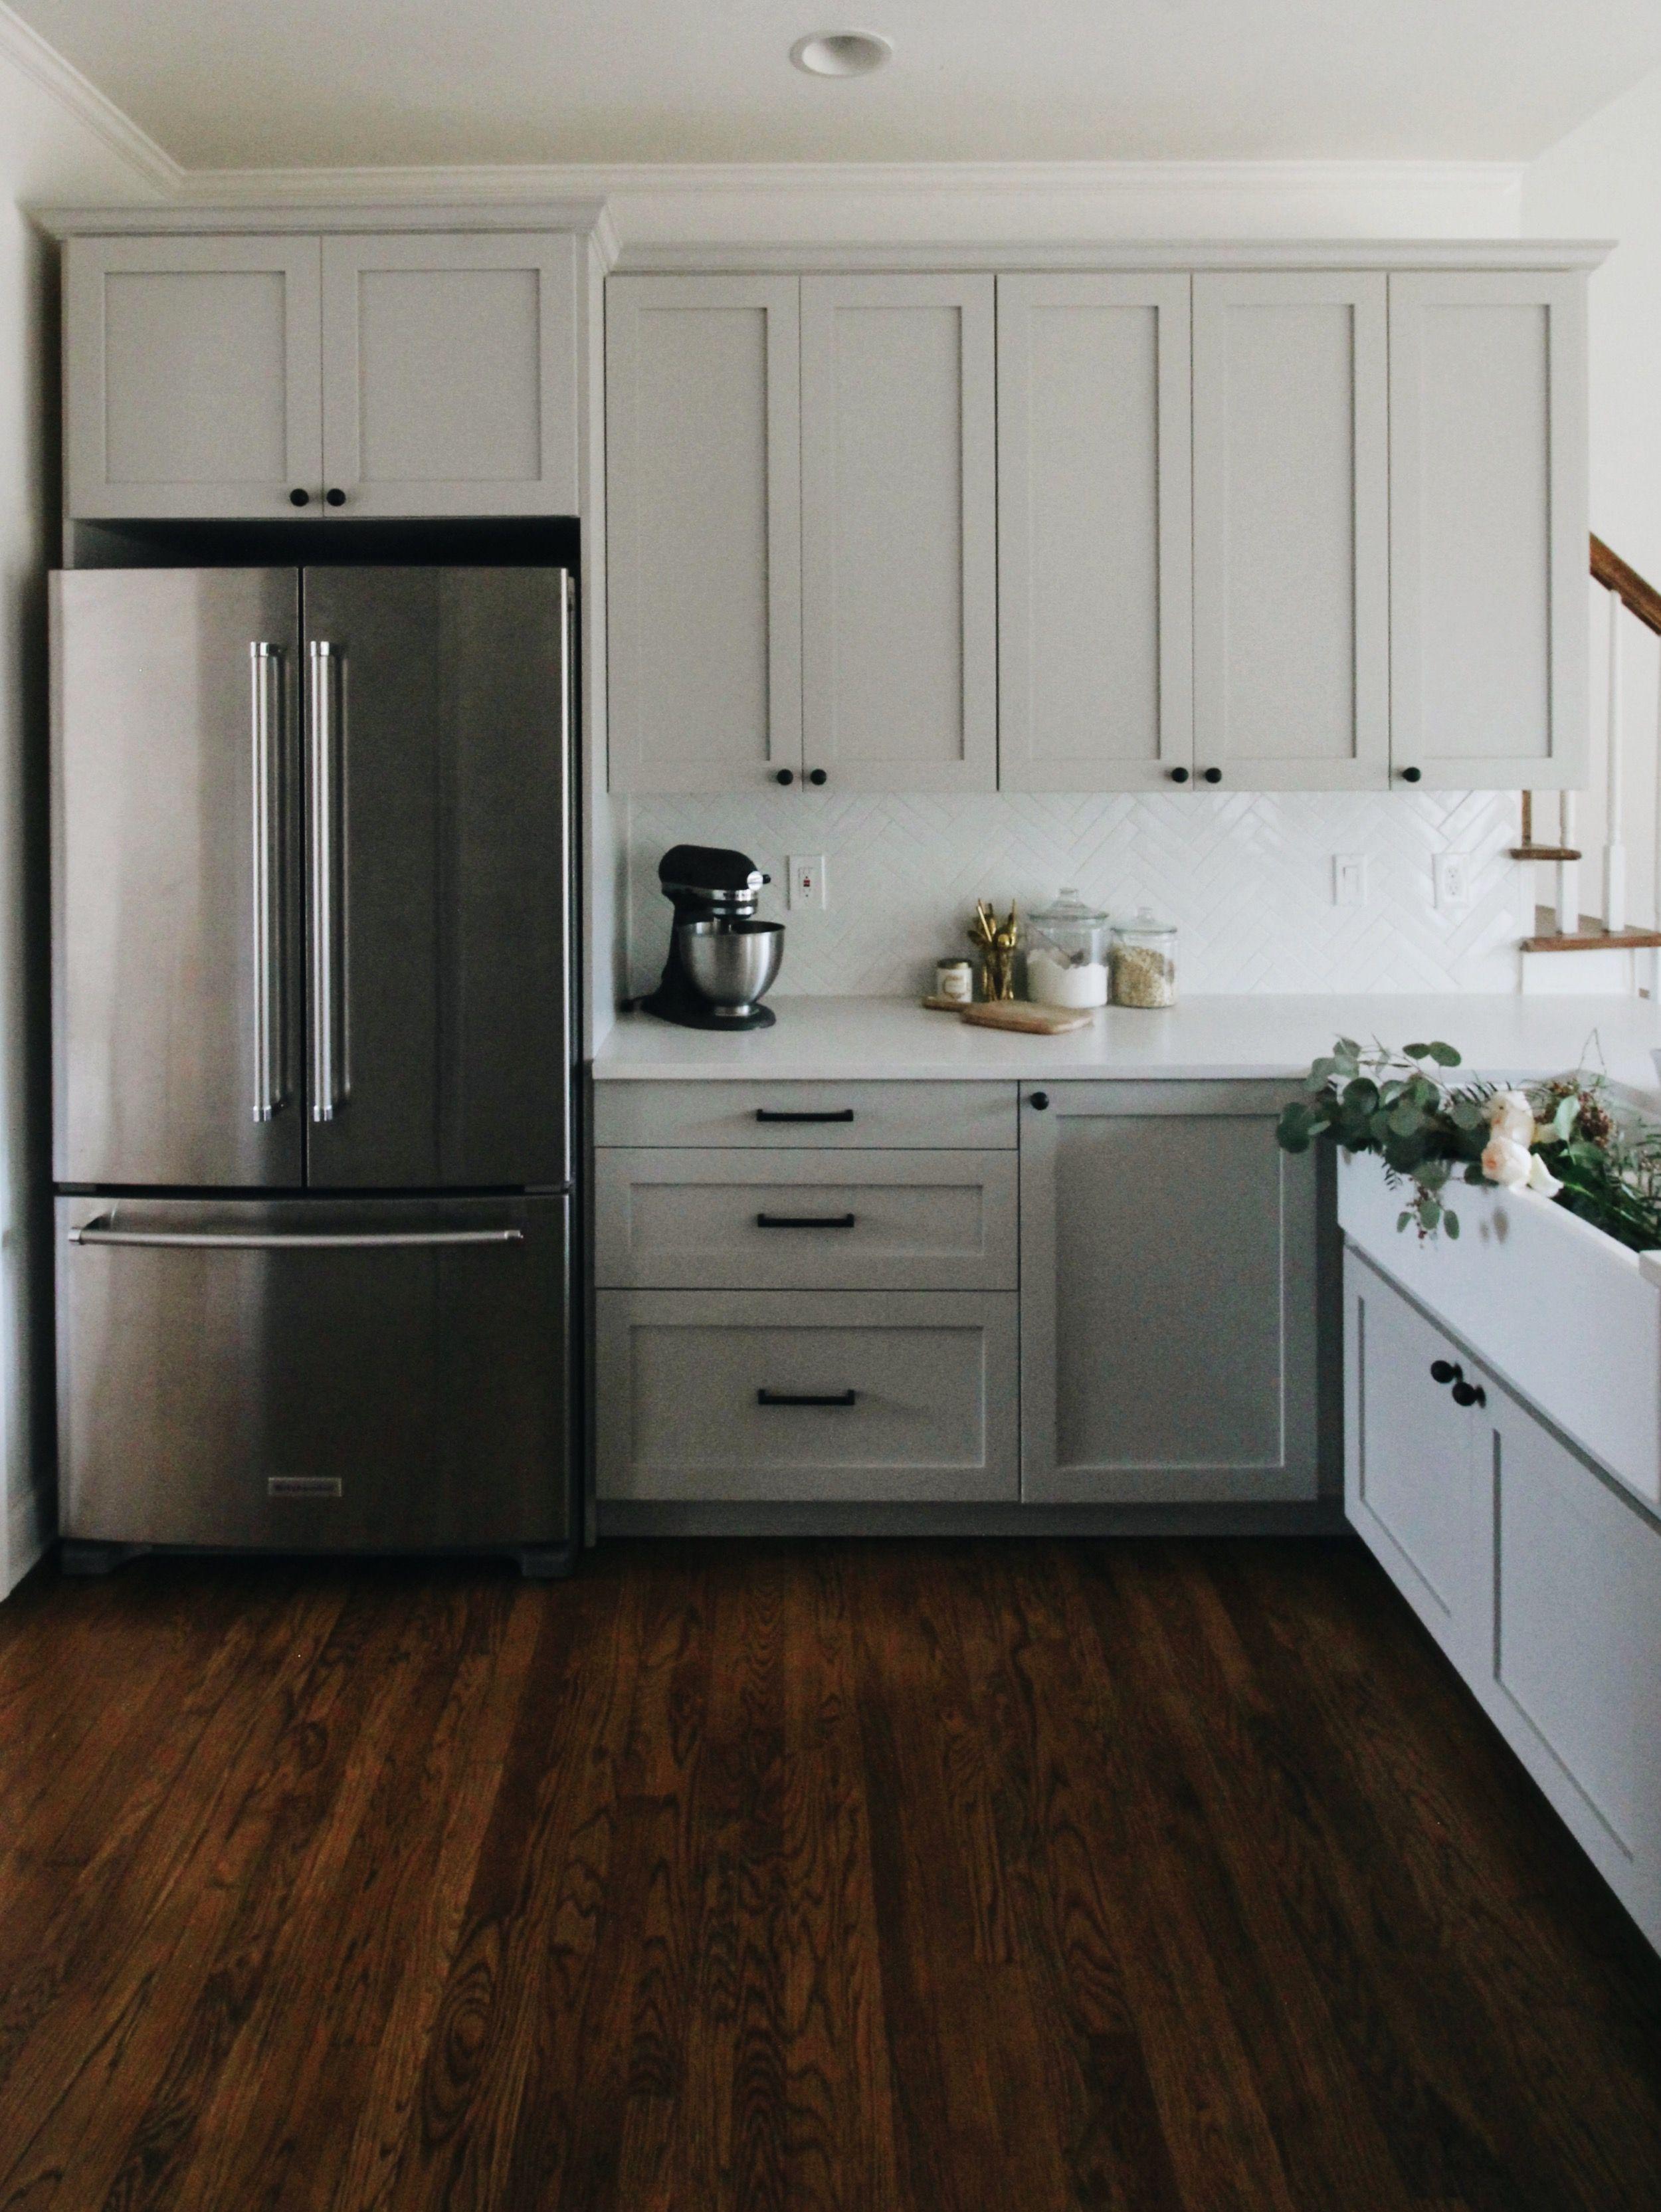 Our Kitchen Tour Kitchens, Ikea and House